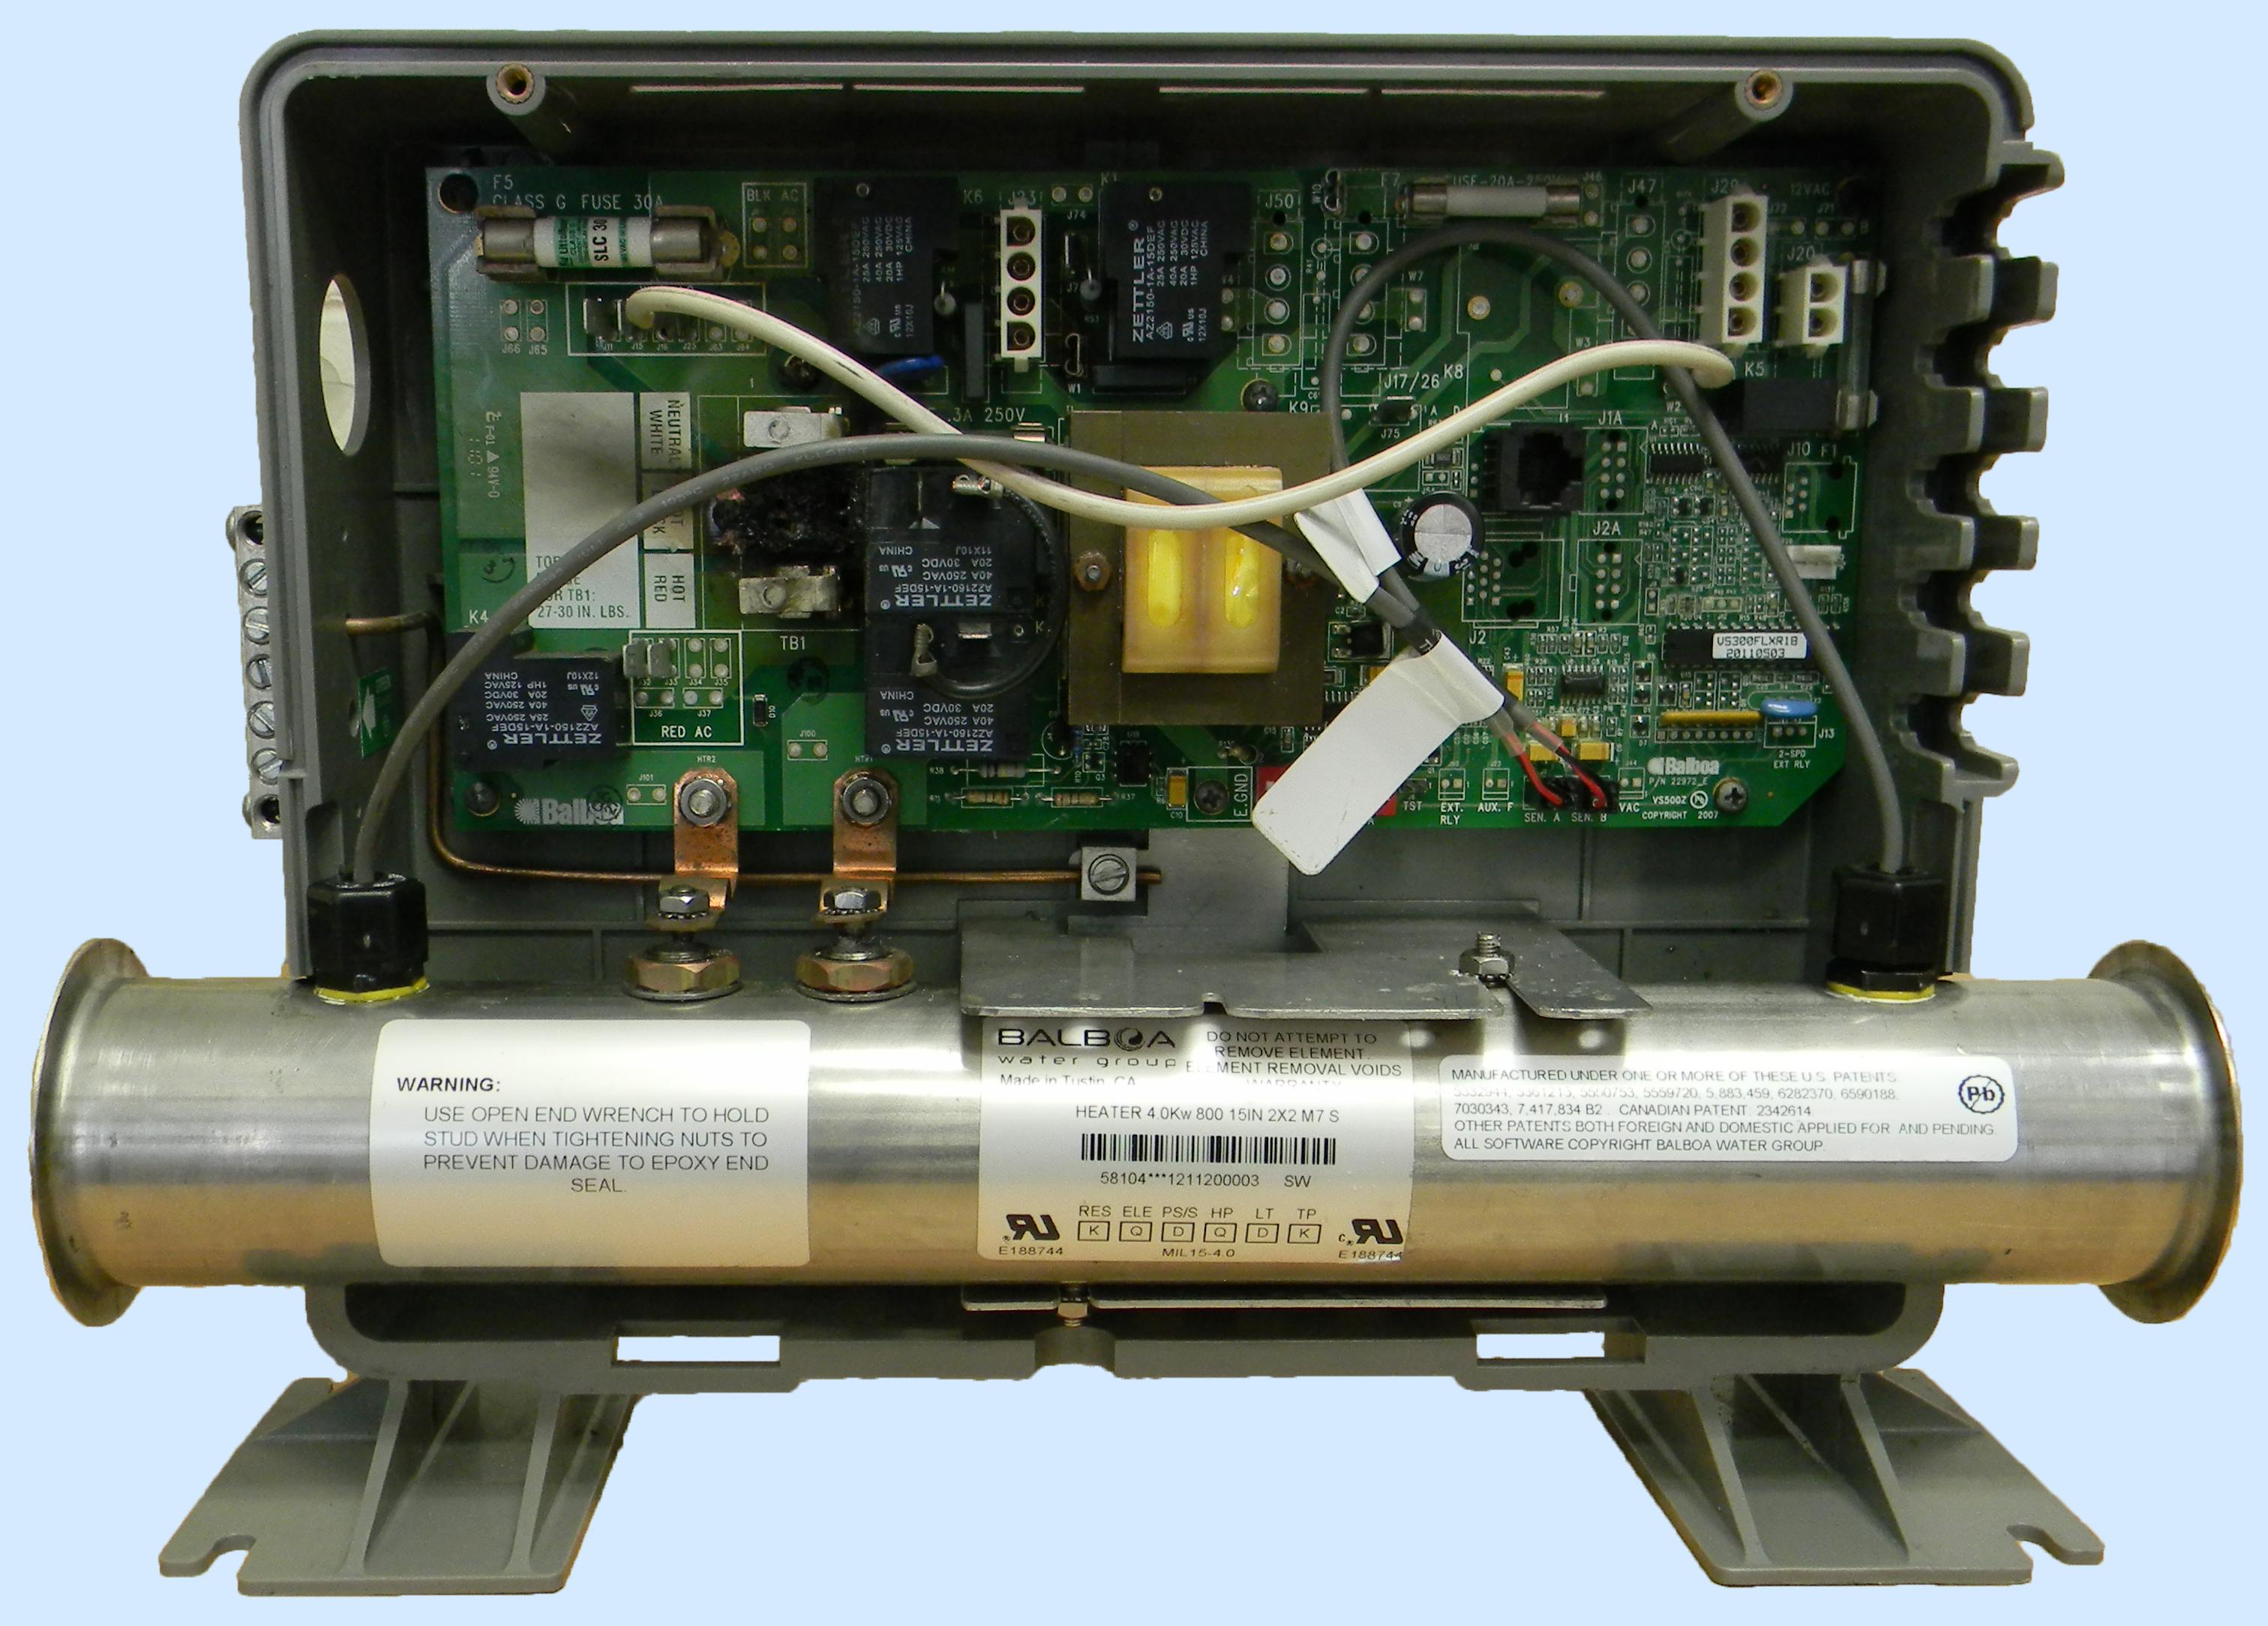 balboa spa heater replacement    balboa